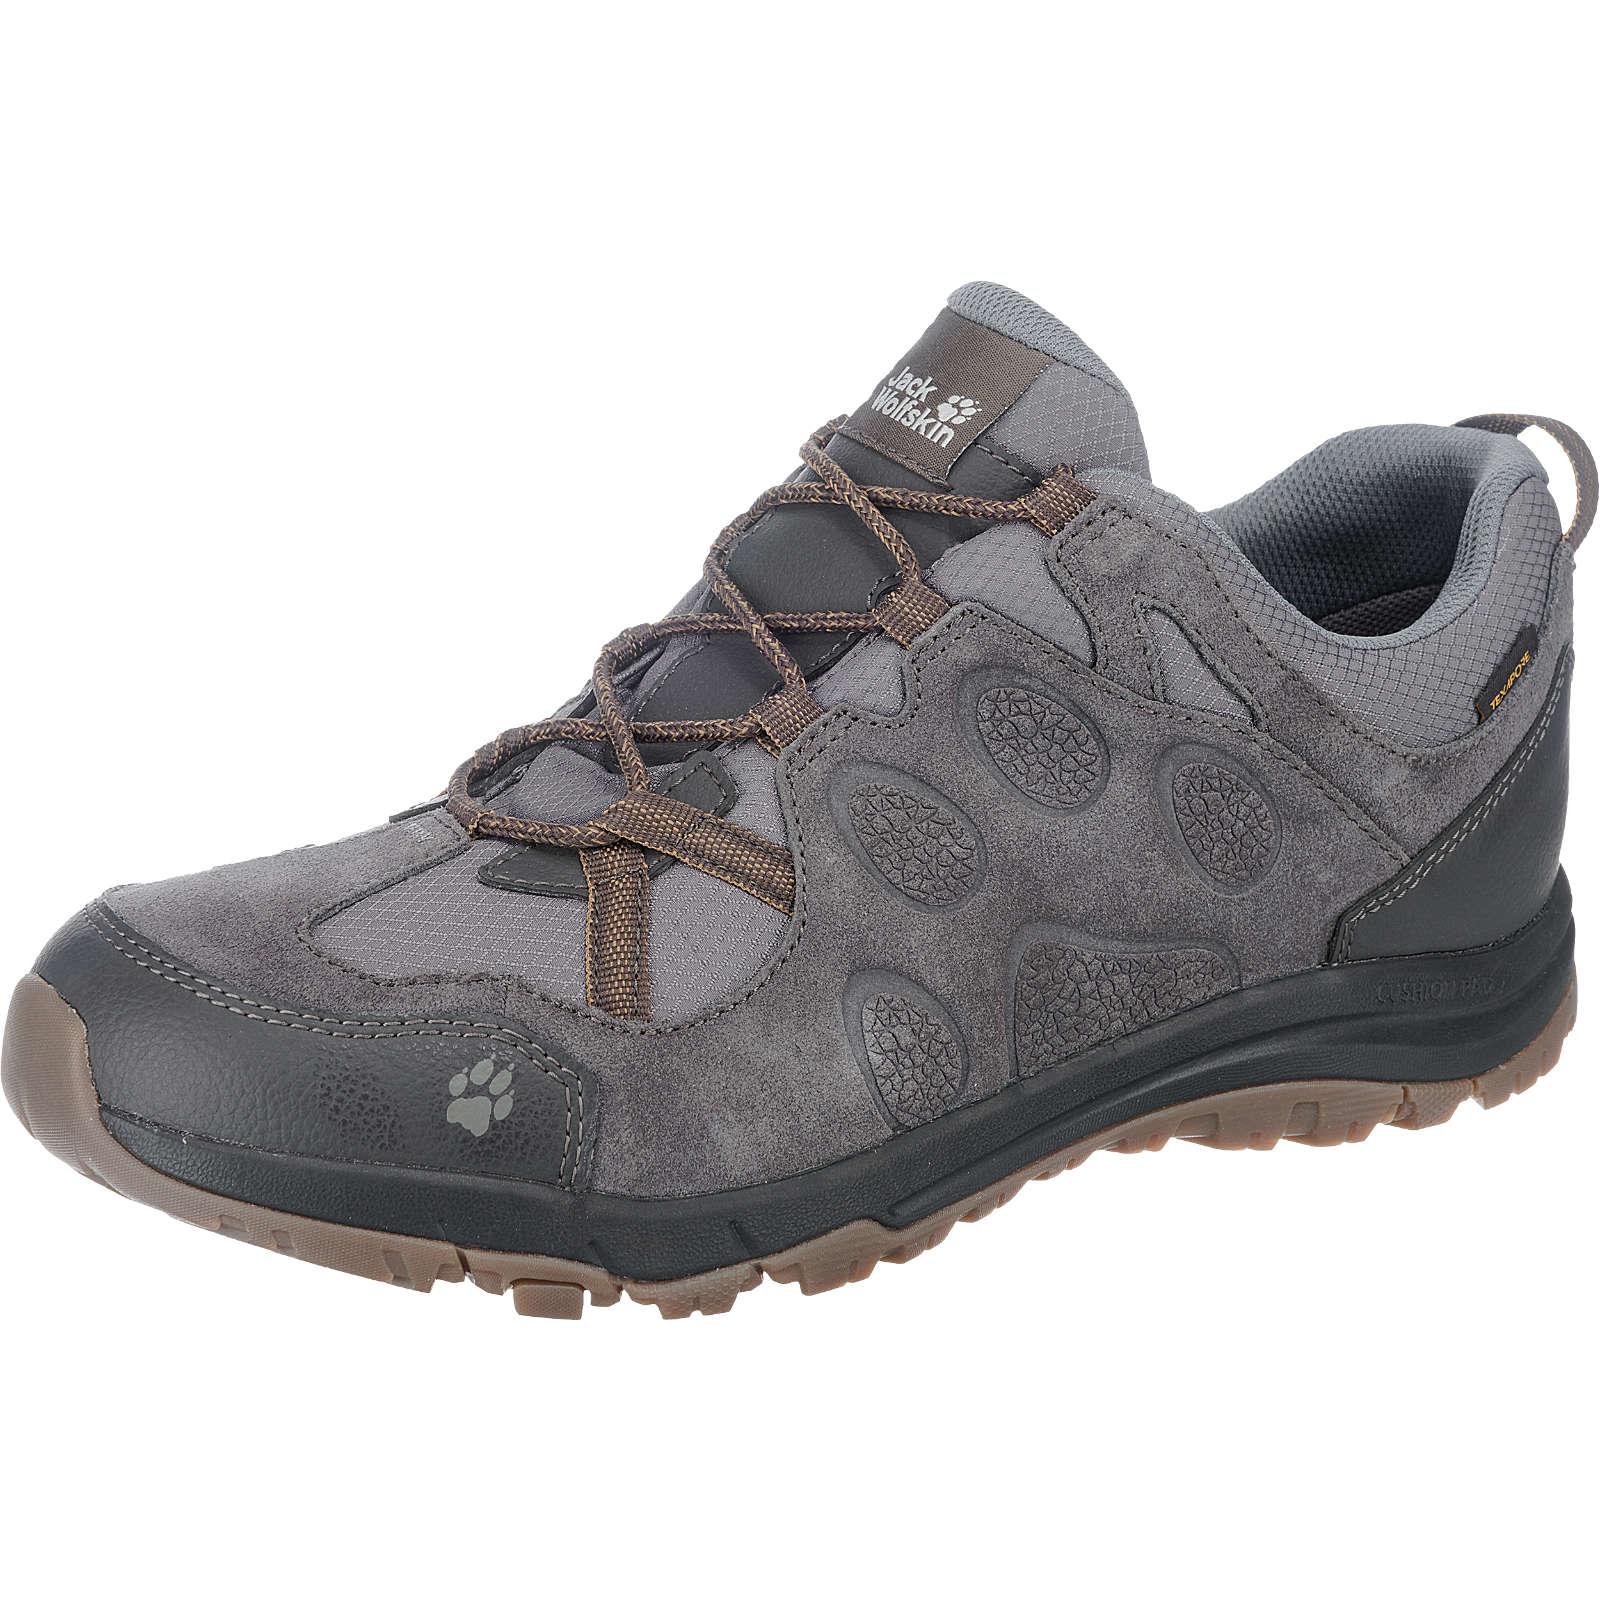 JACK WOLFSKIN Rocksand Texapore Low Outdoor Schuhe wasserdicht grau-kombi Herren Gr. 45,5